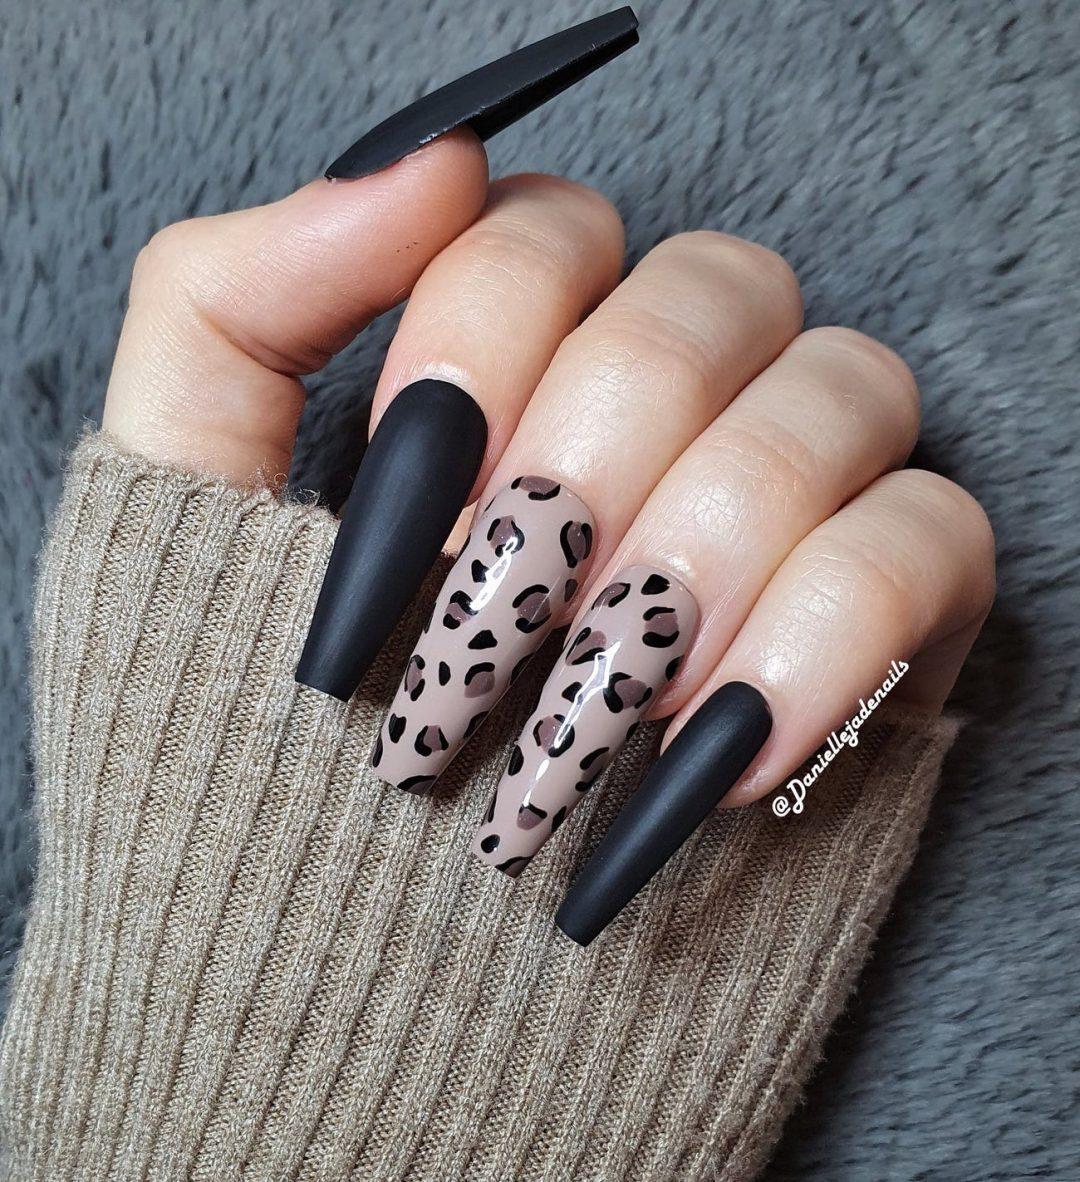 Matte black coffin nails with leopard print nail art